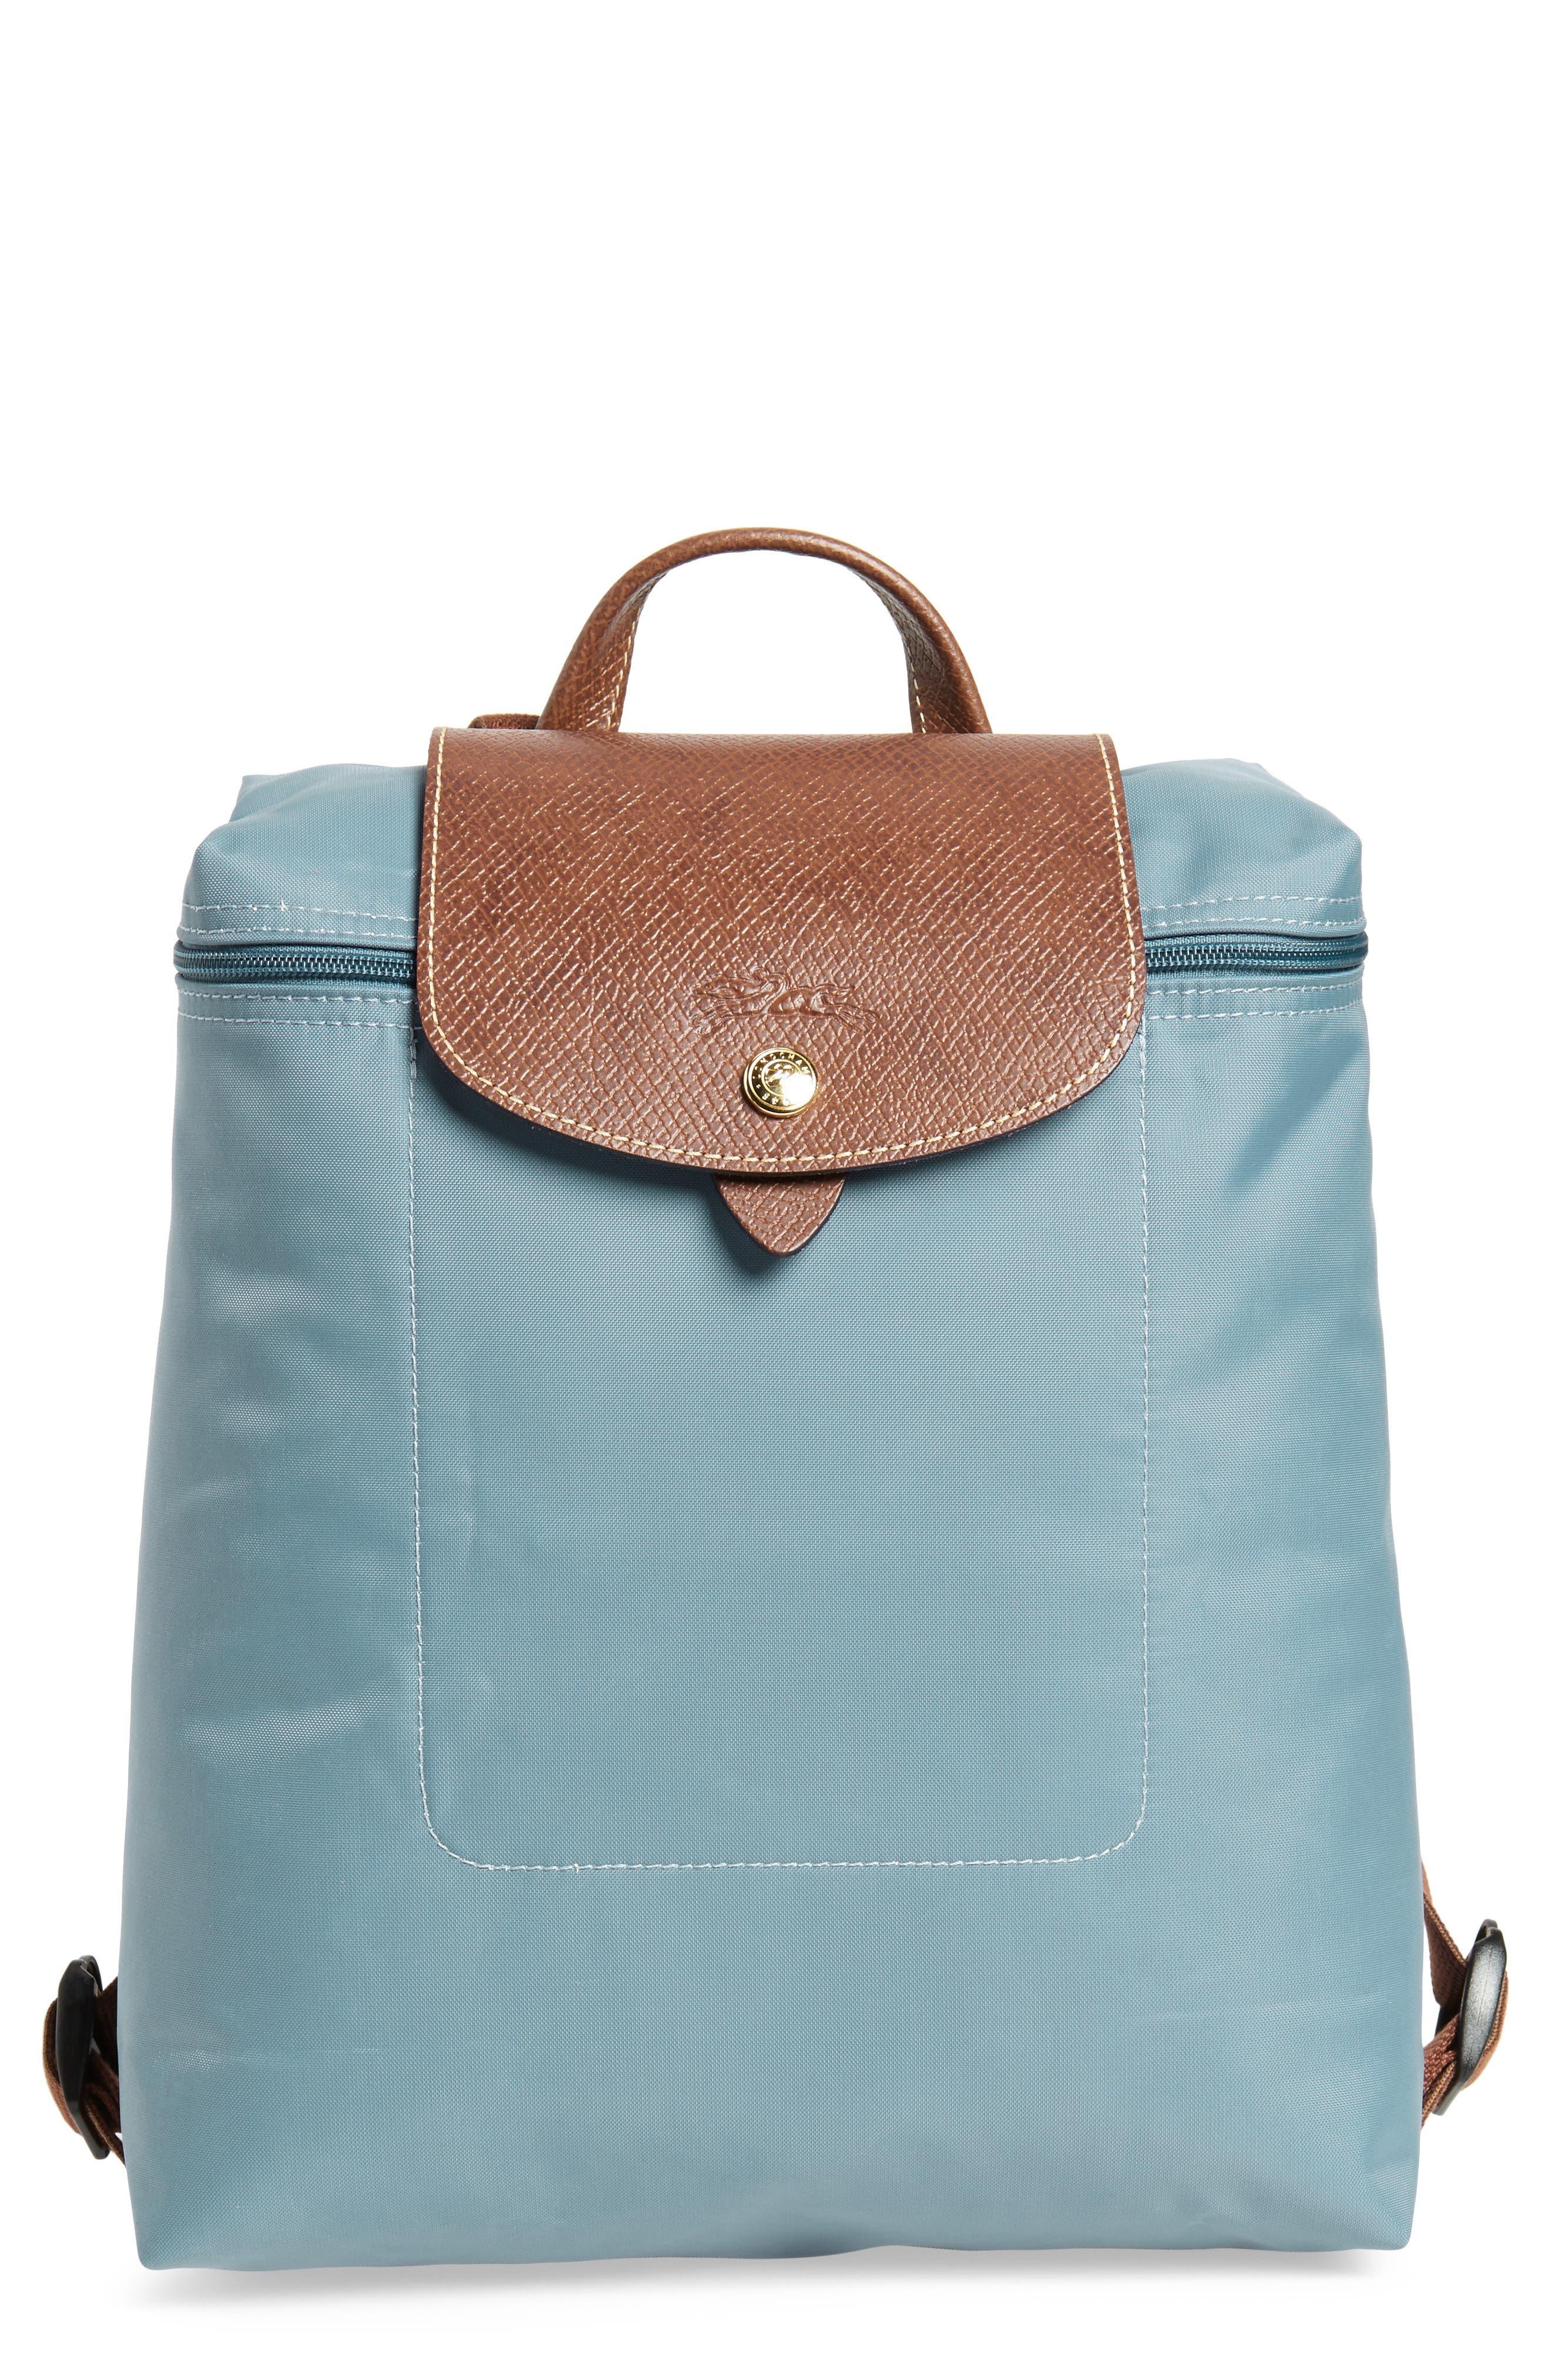 'Le Pliage' Backpack,                             Main thumbnail 1, color,                             ARTICO